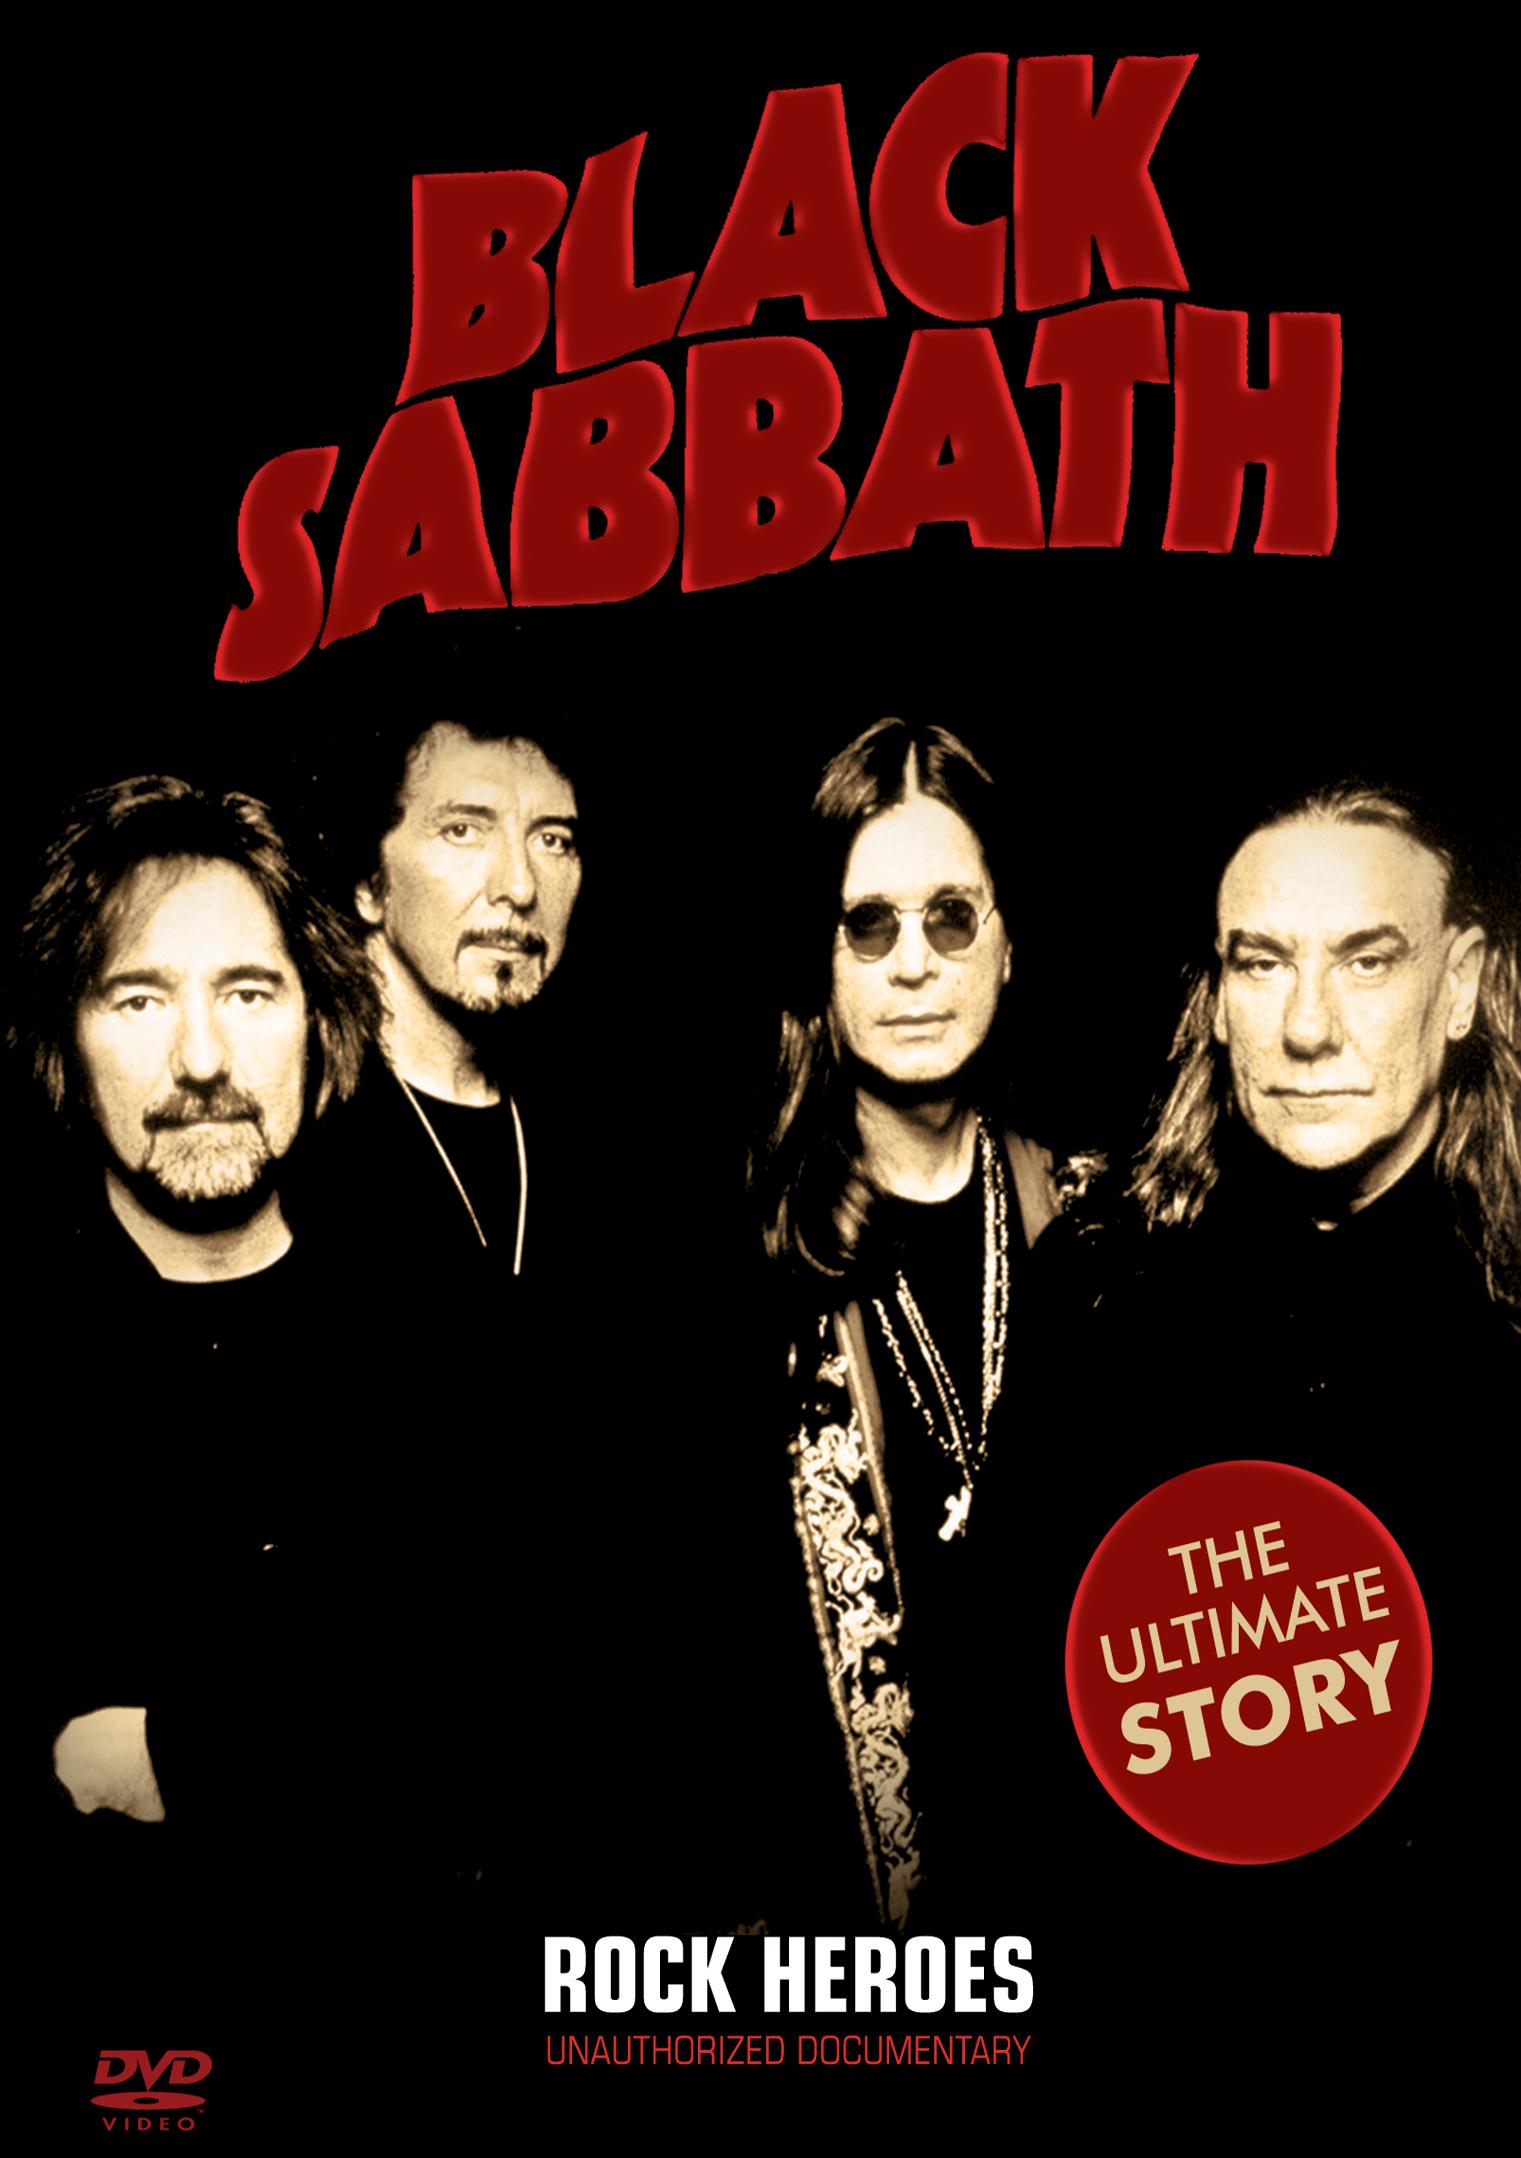 Black Sabbath: Rock Heroes - Unauthorized